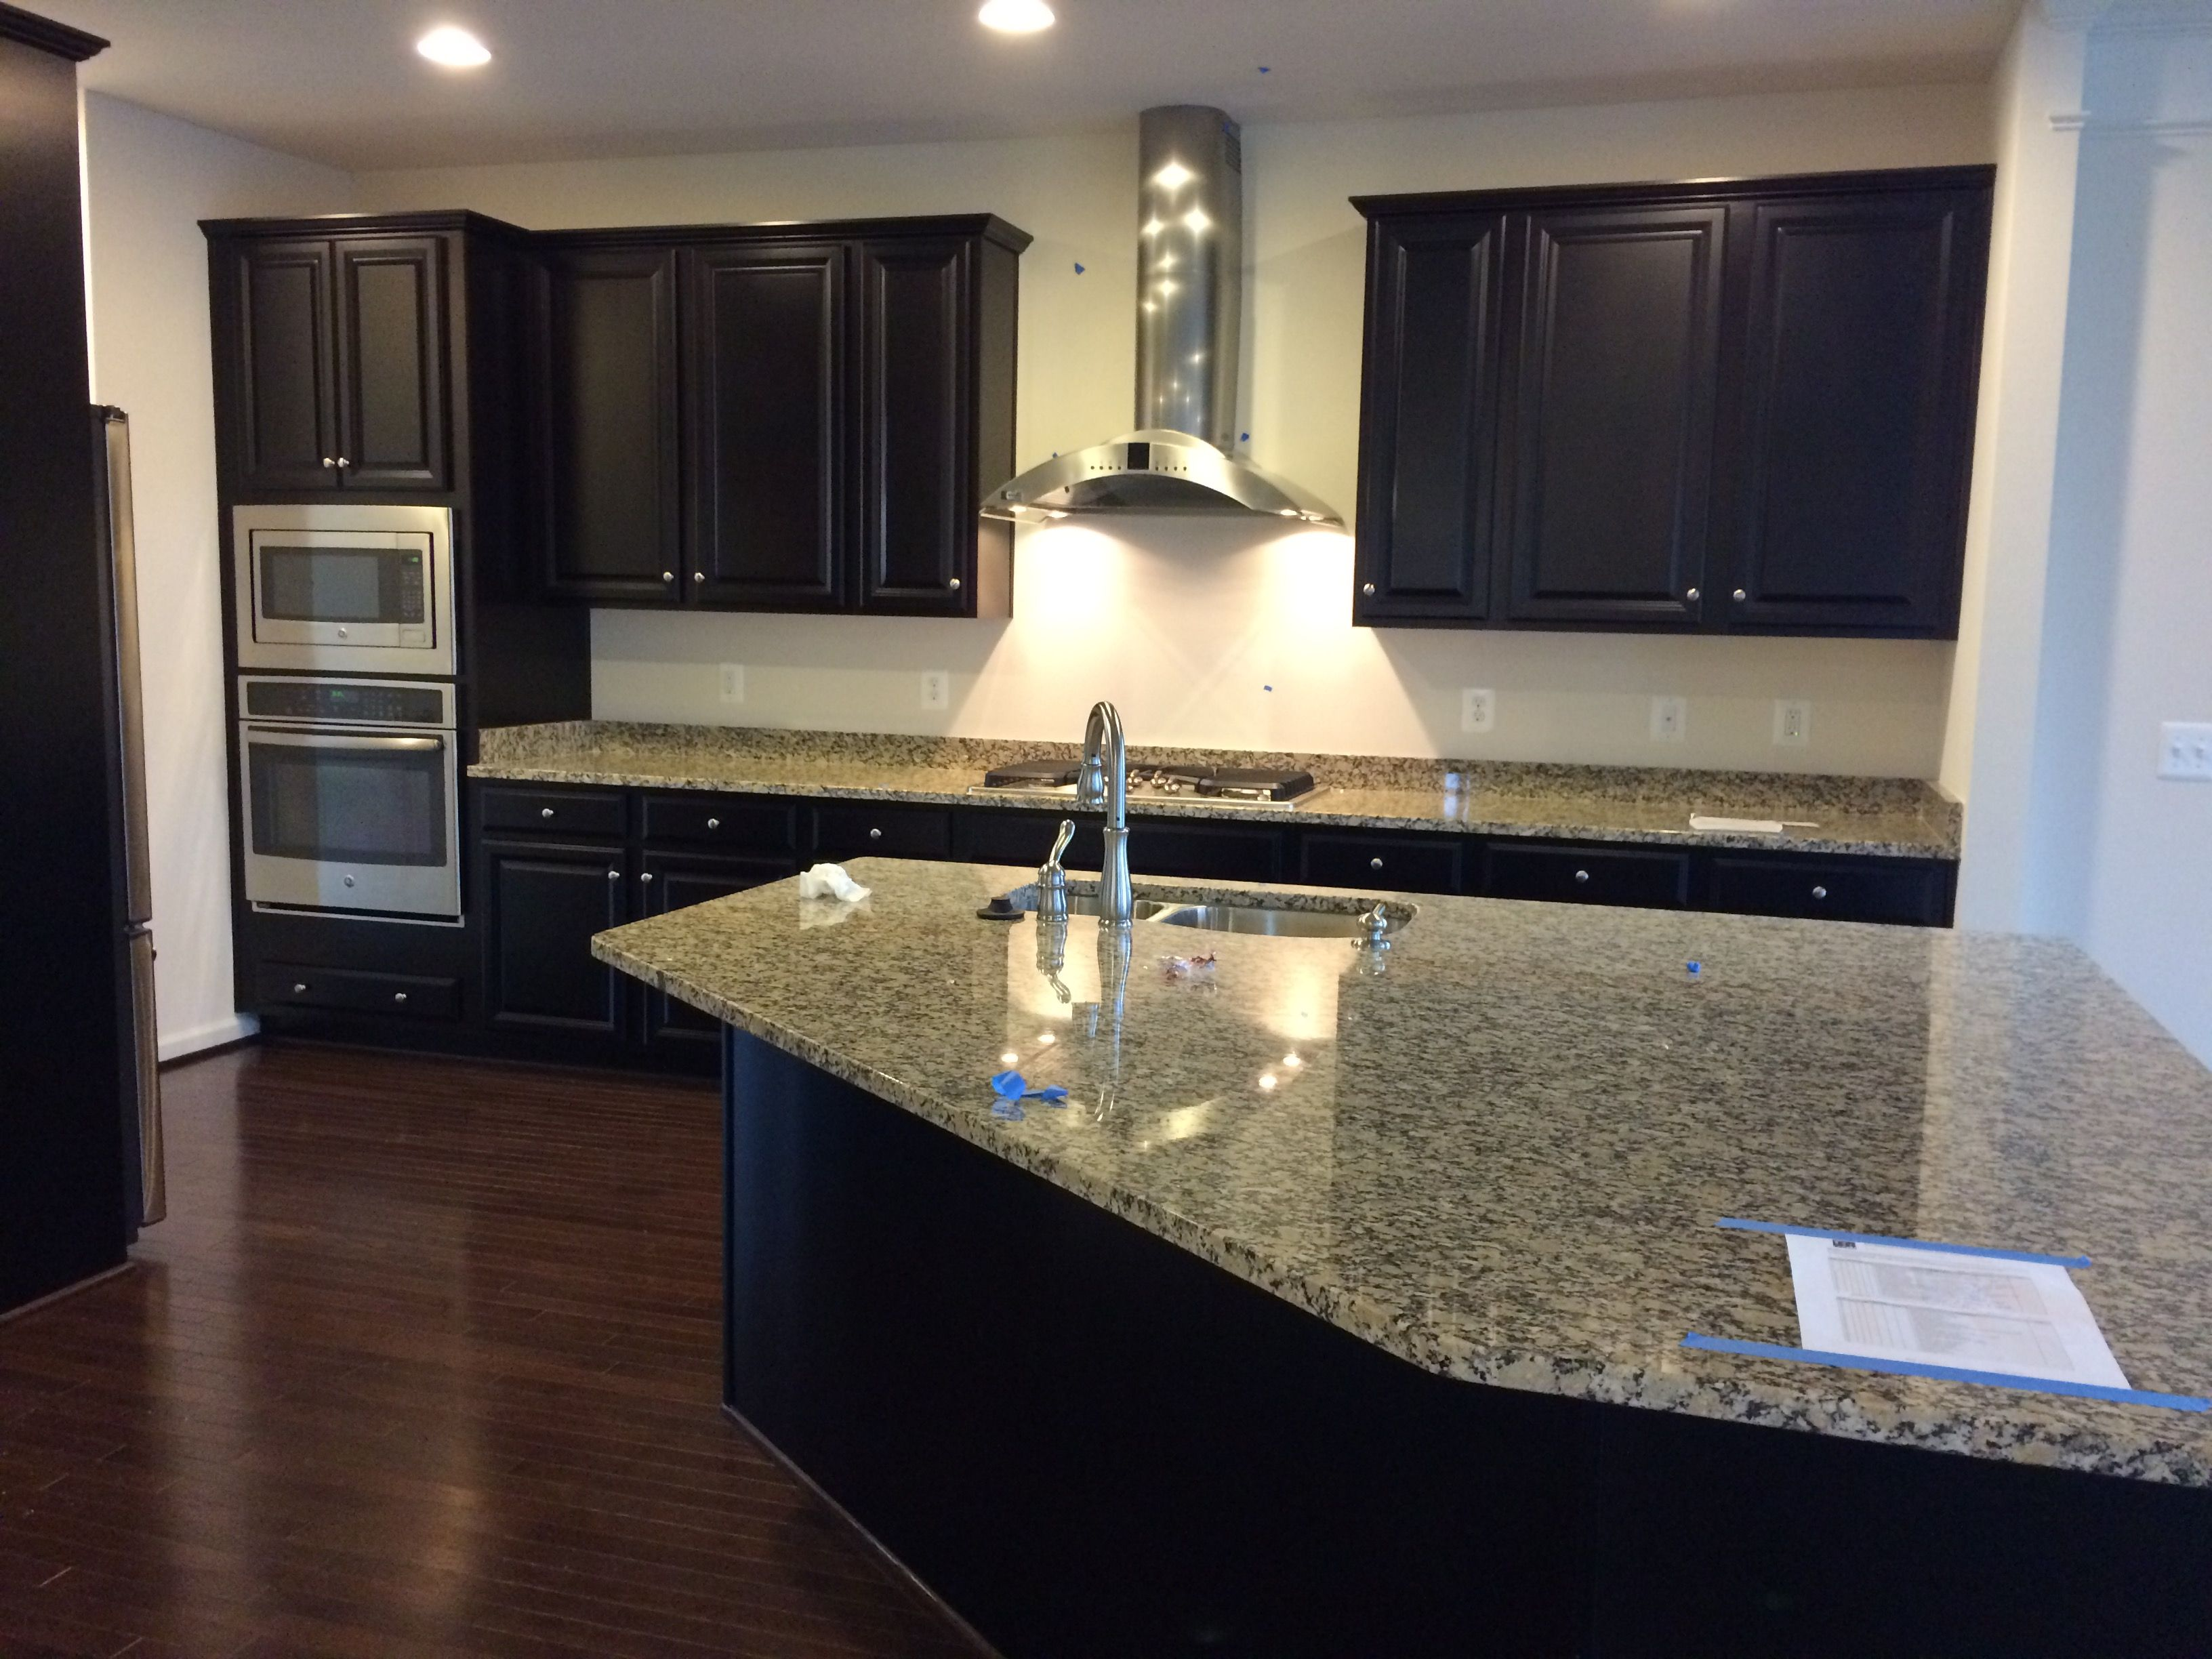 Kitchen Cabinets Espresso level 5 espresso kitchen cabinets, level 2 autumn beige granite